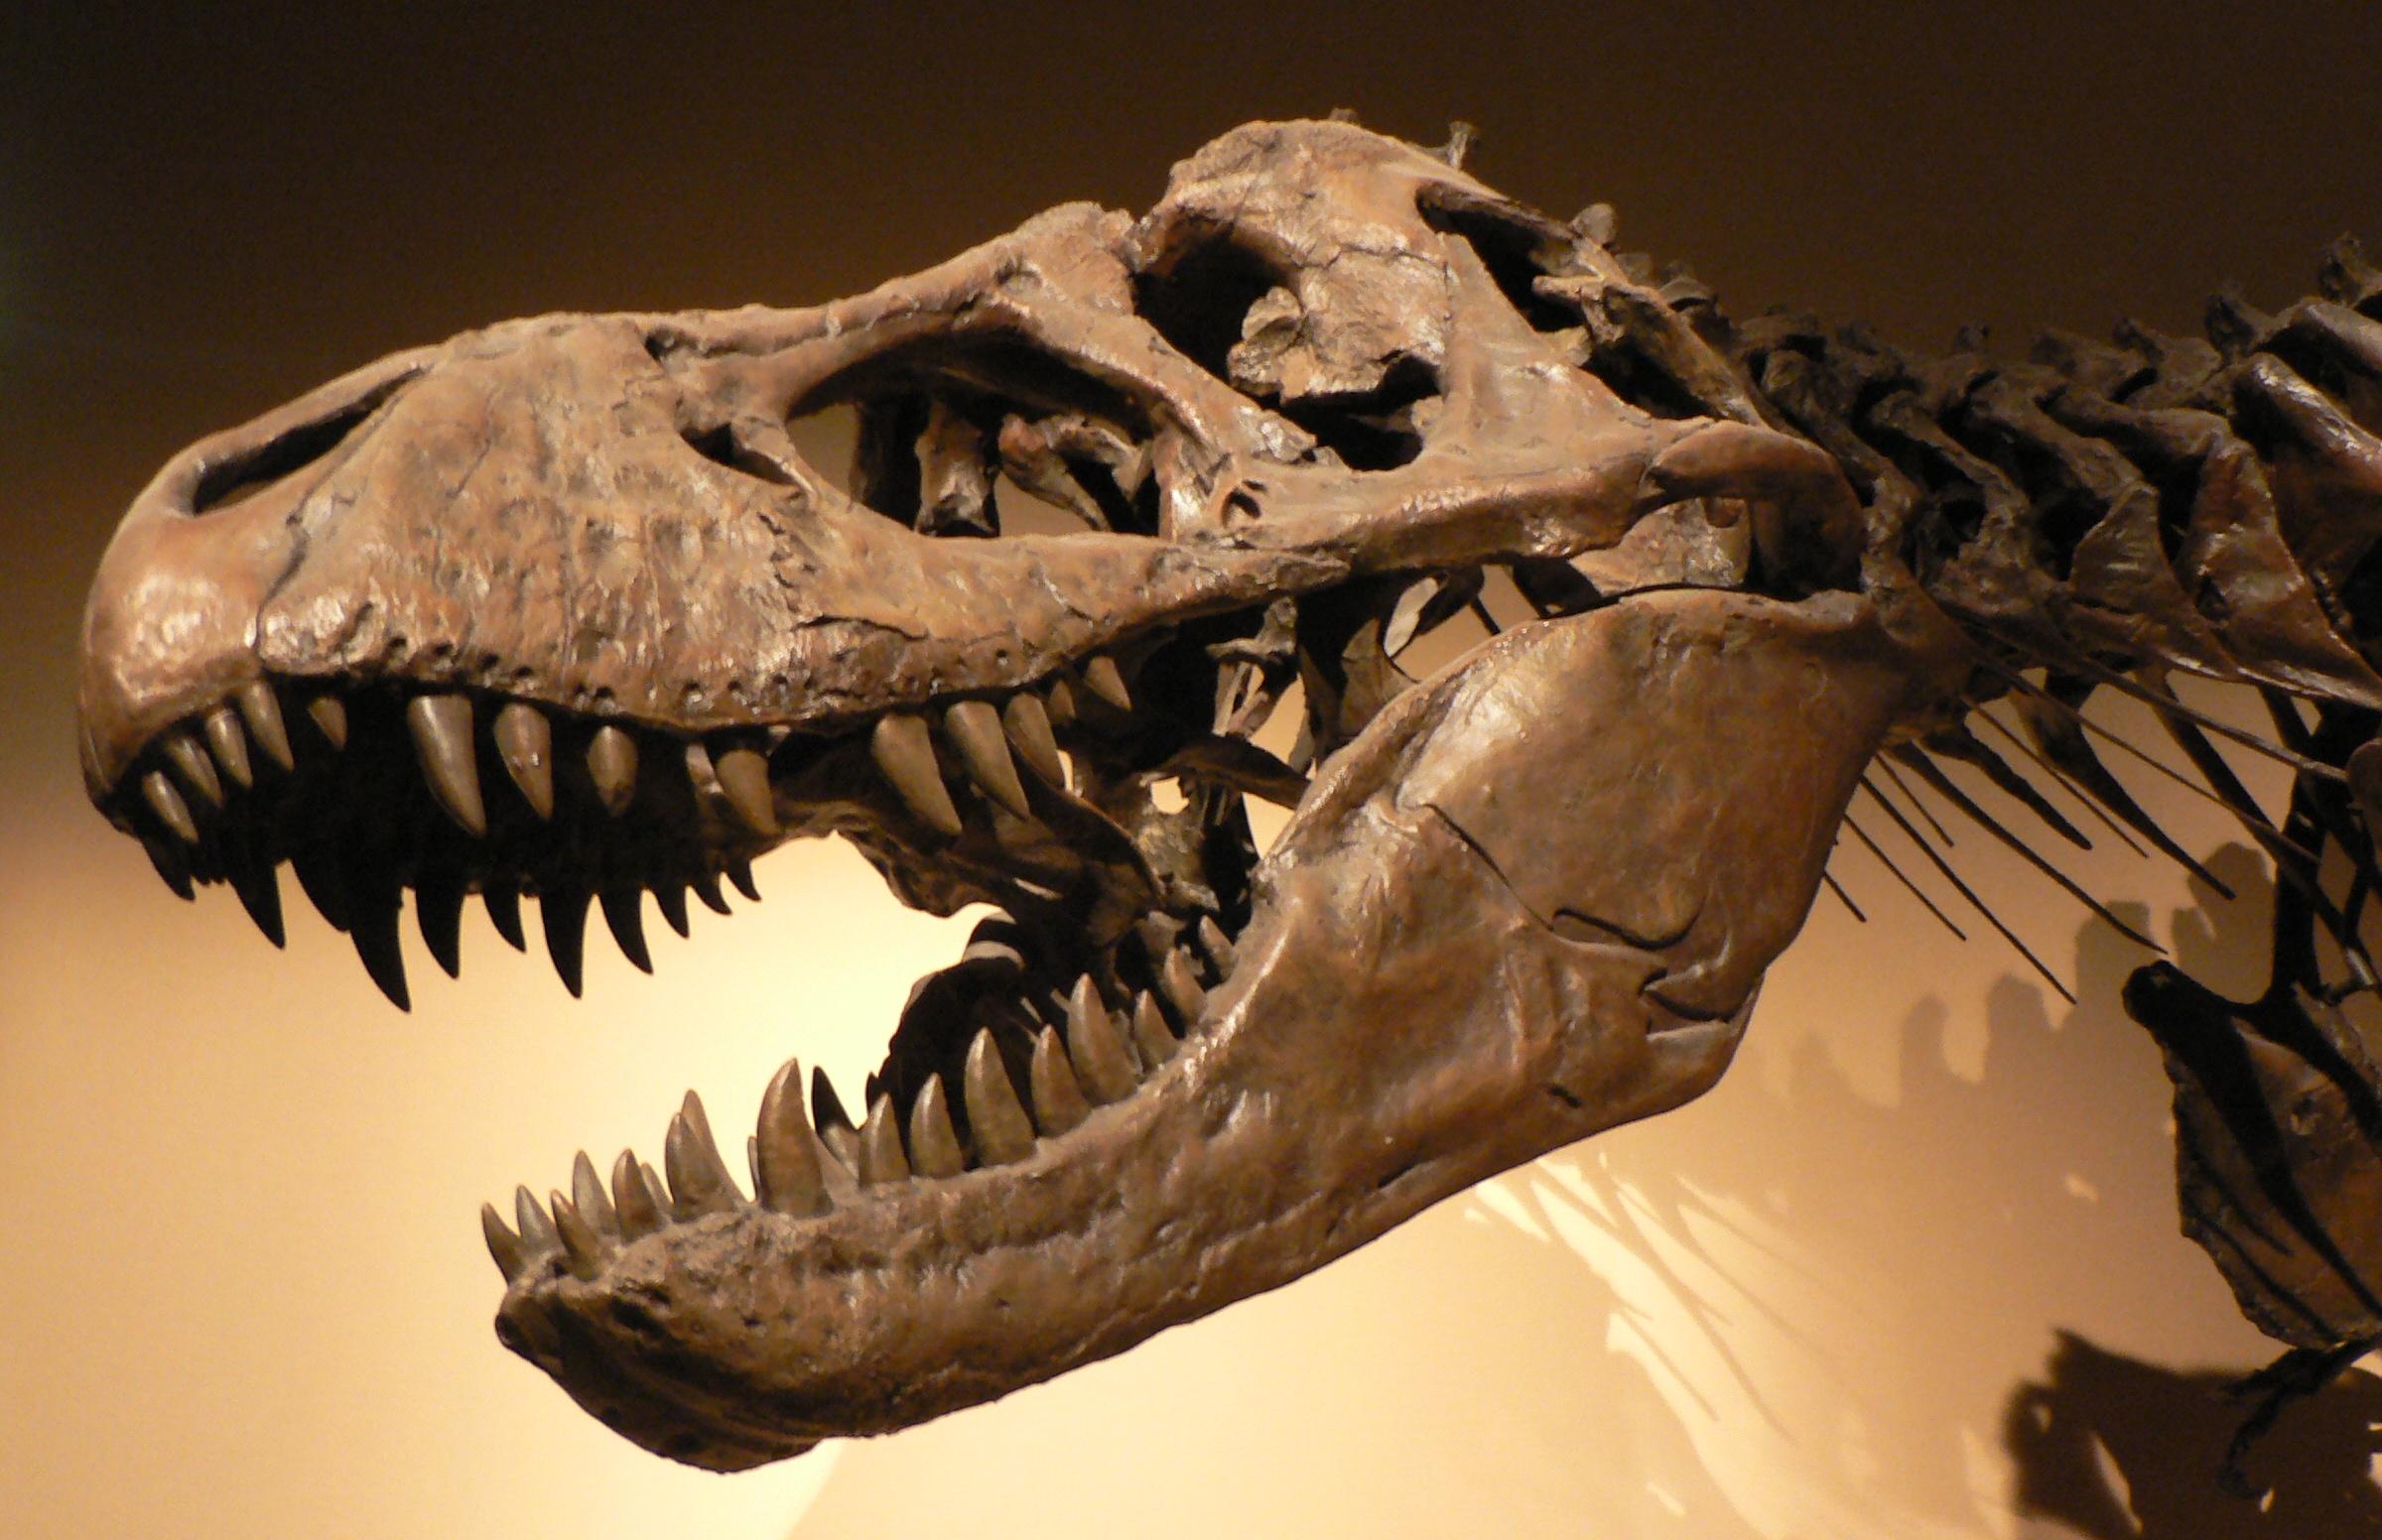 http://upload.wikimedia.org/wikipedia/commons/a/ab/Palais_de_la_Decouverte_Tyrannosaurus_rex_p1050042.jpg